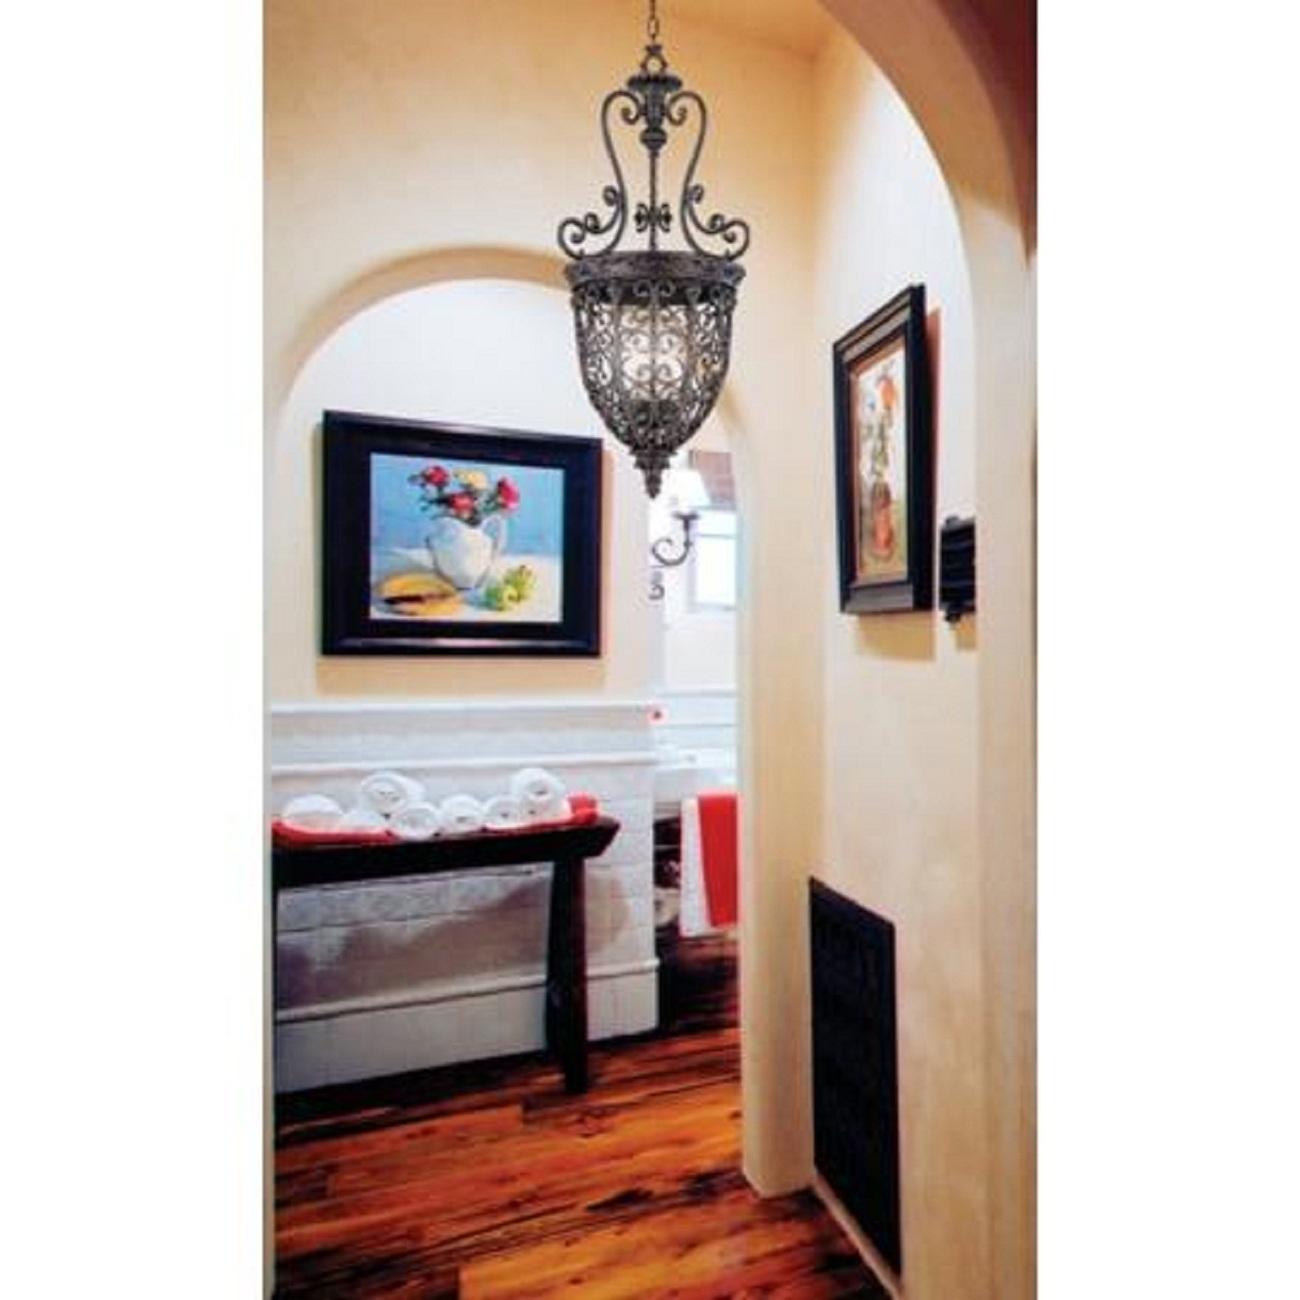 Open Scroll Foyer Chandelier : Vintage antique style rubbed bronze finish open scroll